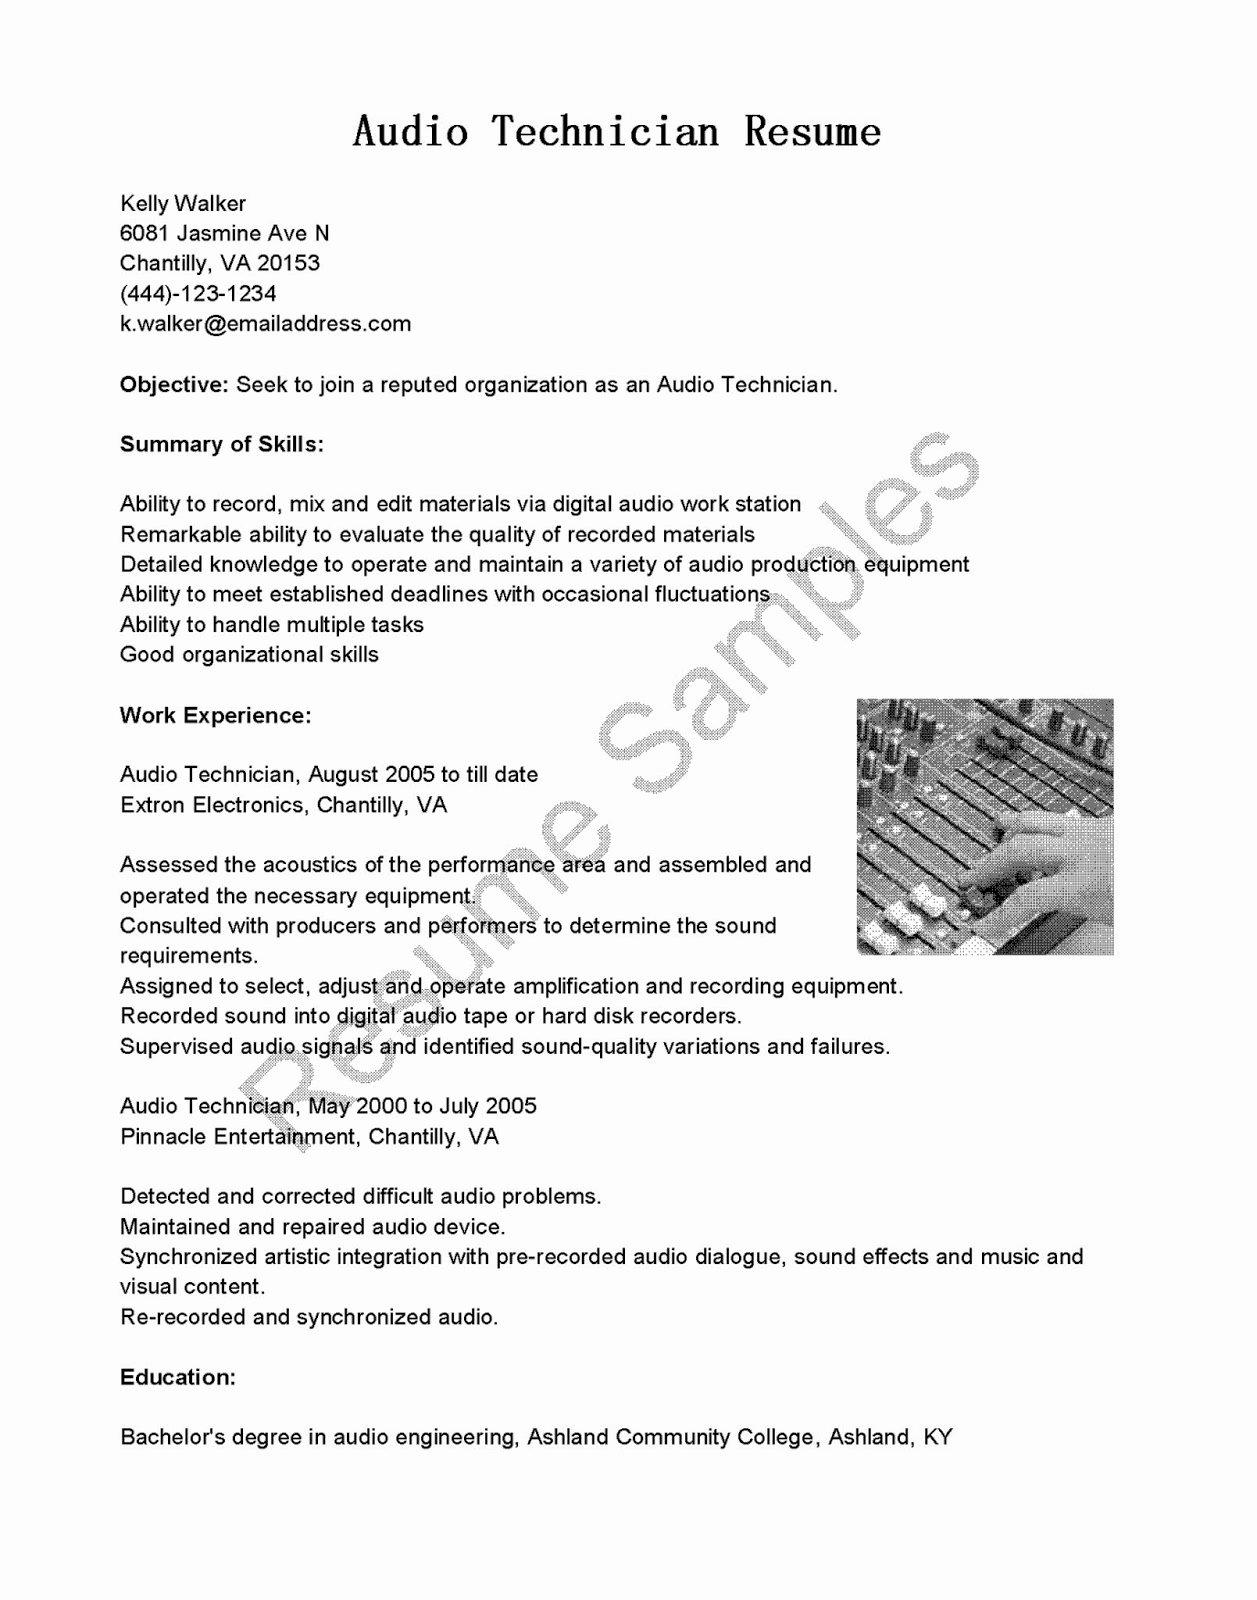 Audio Engineer Resume Sample Elegant Audio Engineer Cv Template Image Collections Certificate